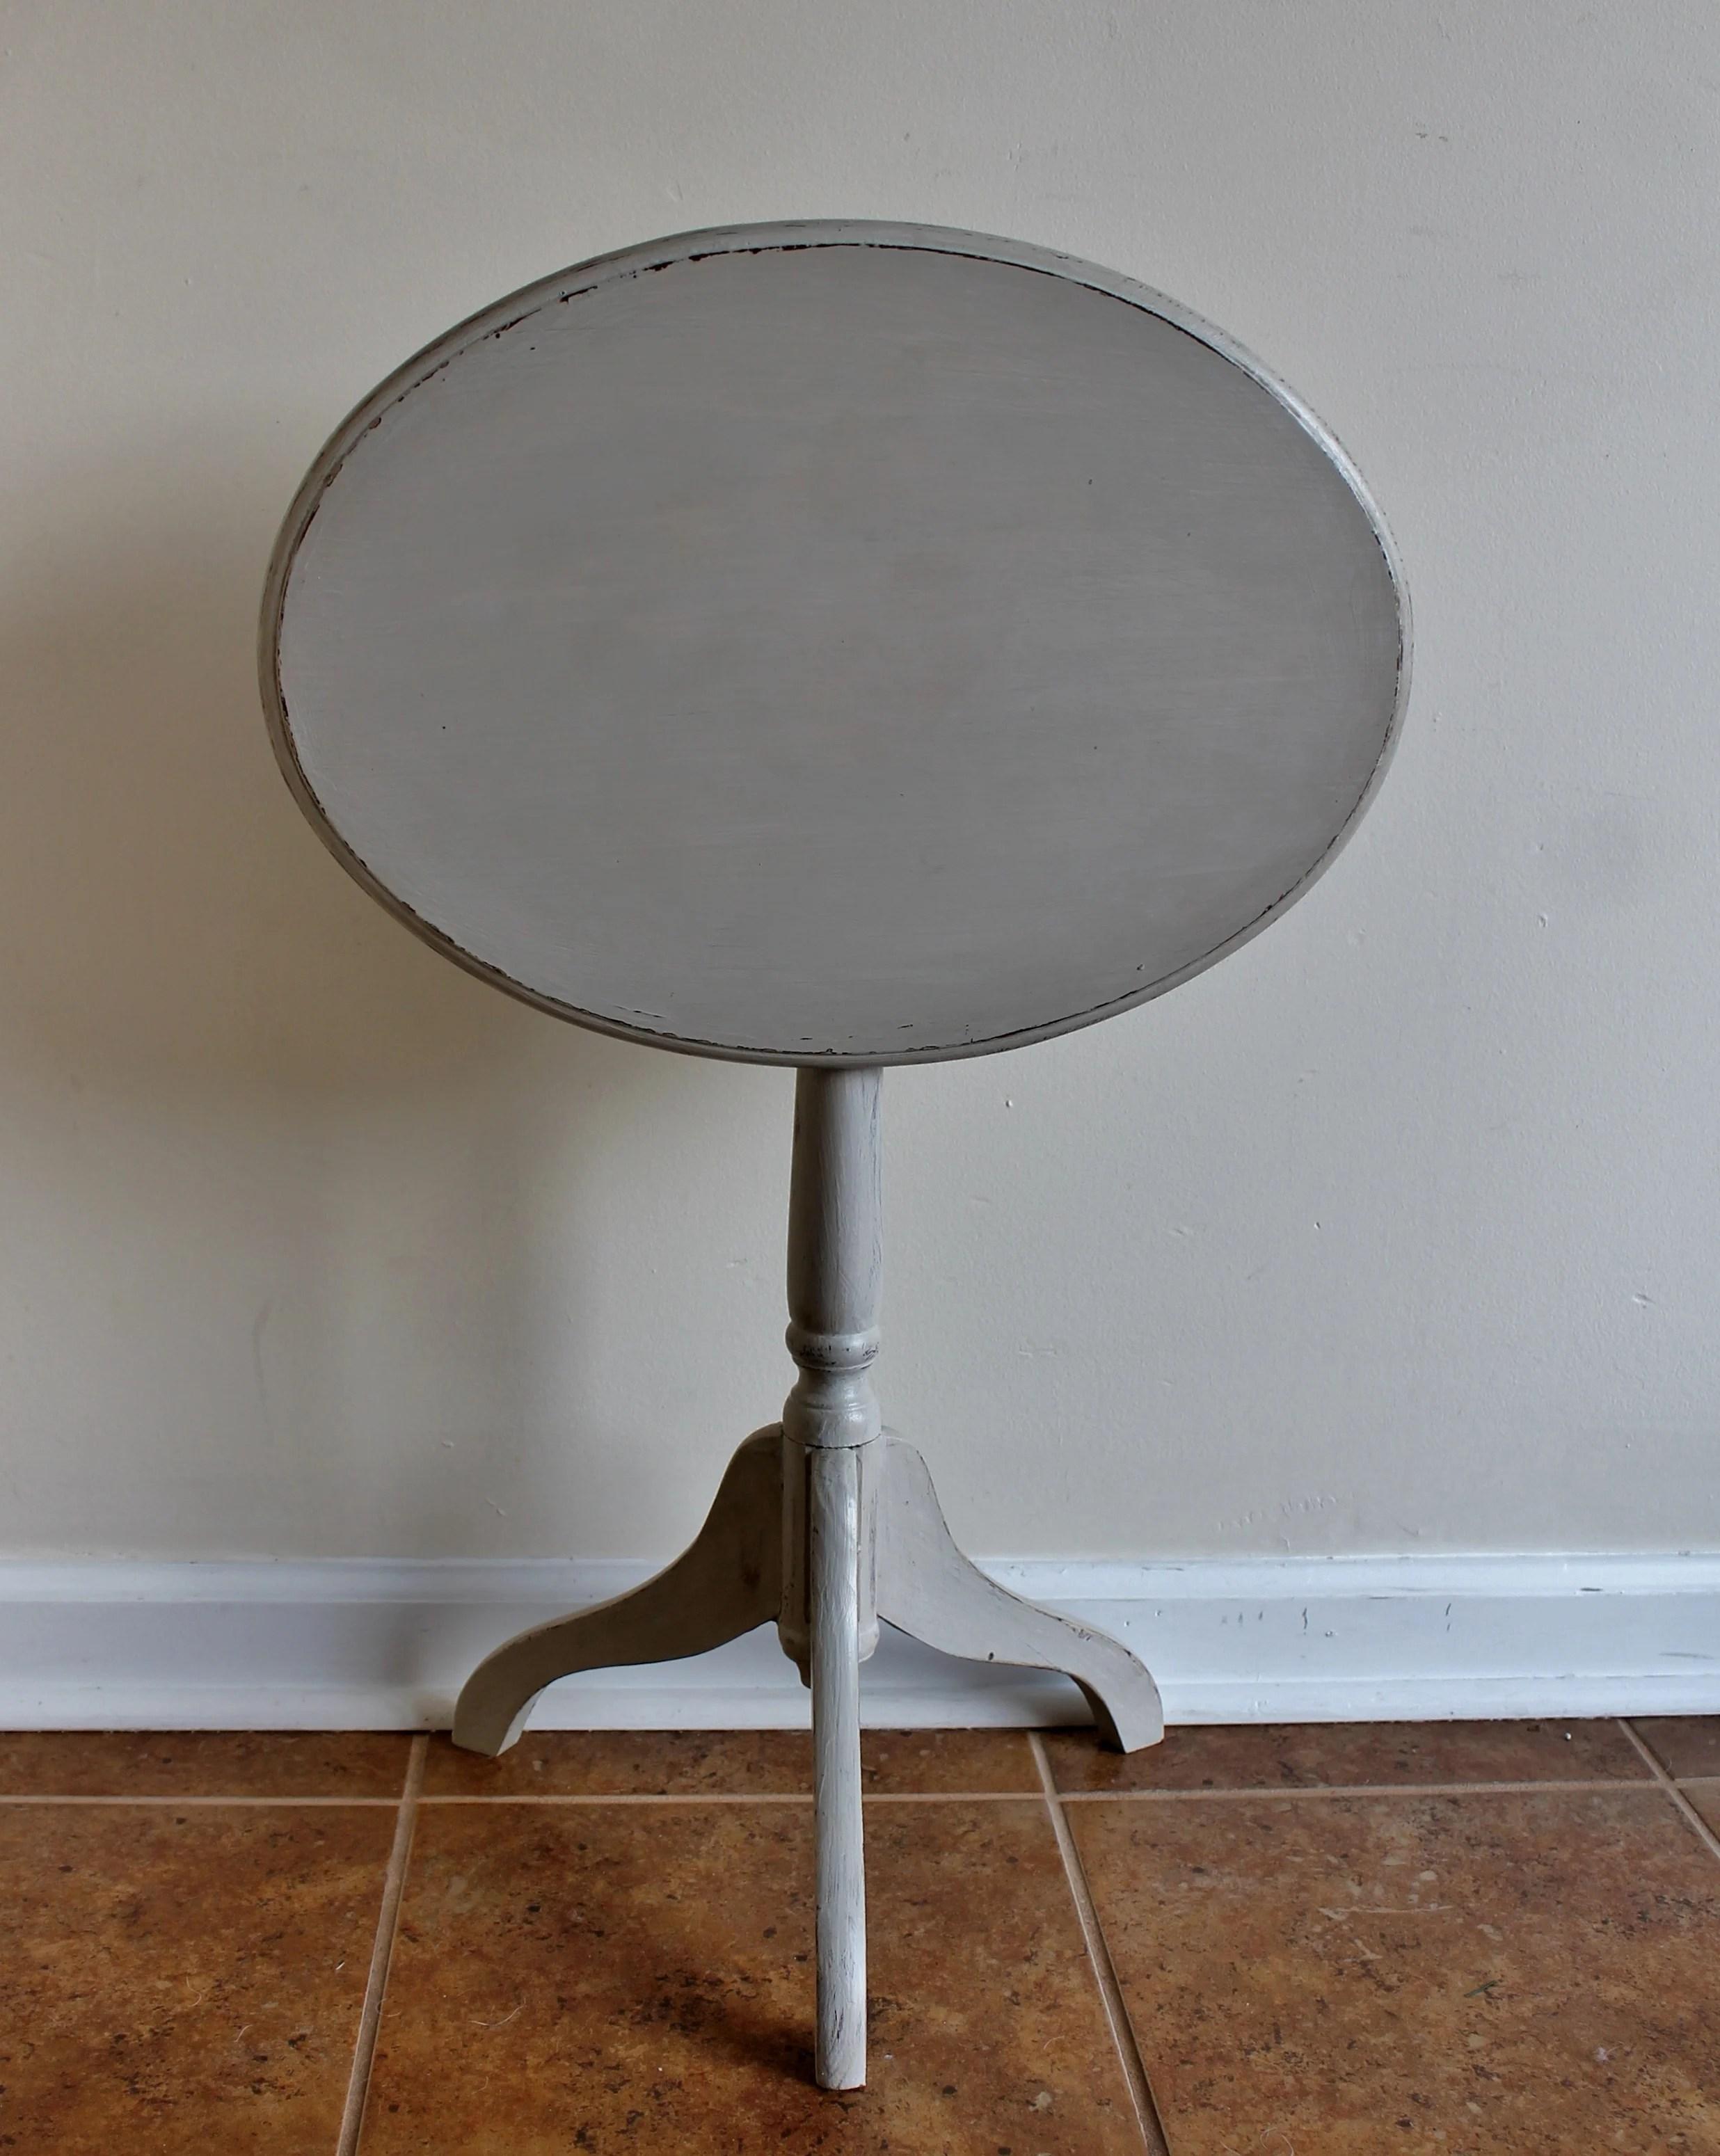 Tilt Top Table Tilted Down